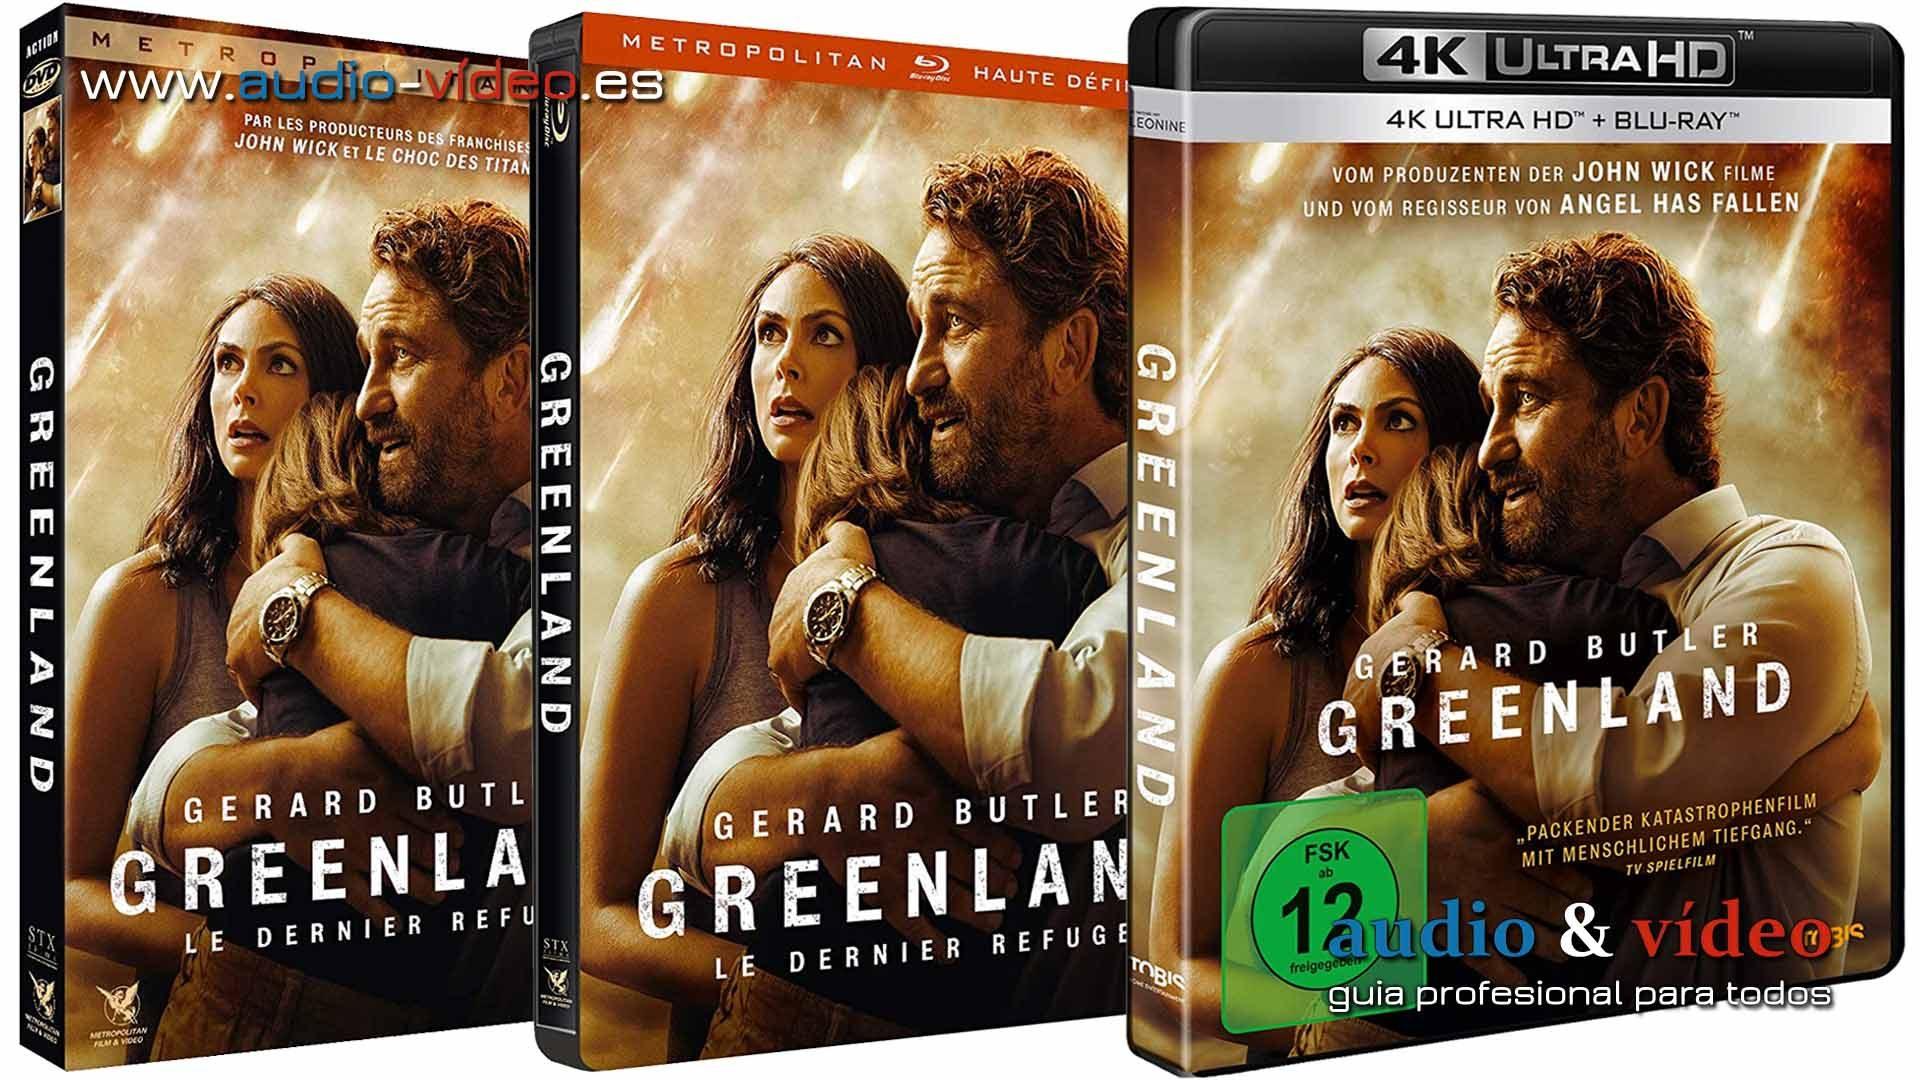 Greenland – 4K, UHD, BluRay, DVD + soundtrack